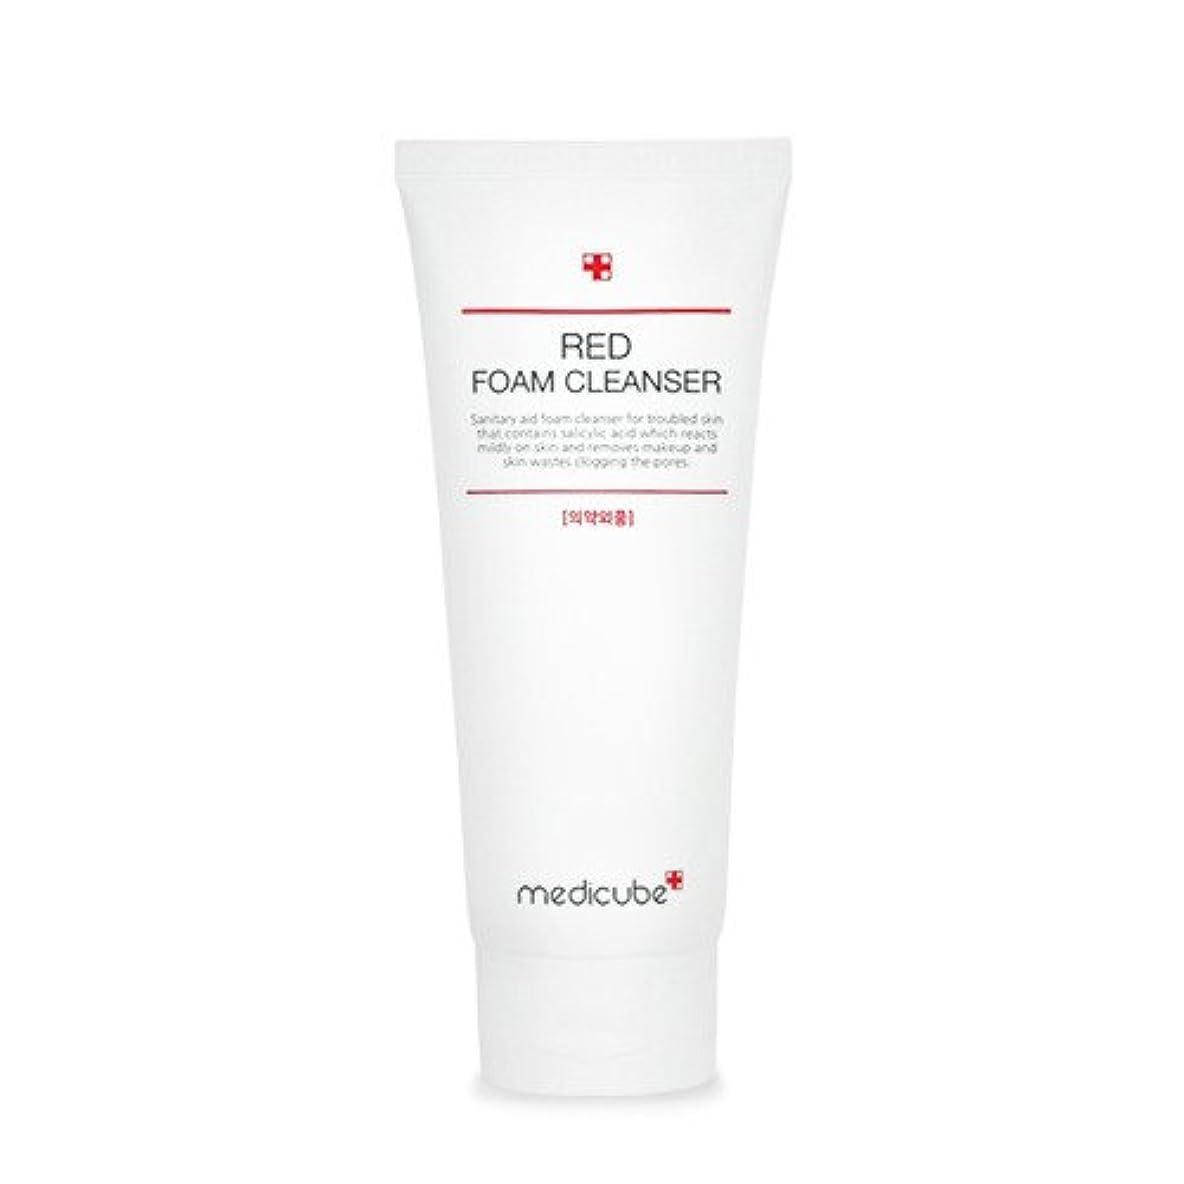 [Medicube]Red Foam Cleanser 120ml / メディキューブレッドクレンジングフォーム / 正品?海外直送商品 [並行輸入品]